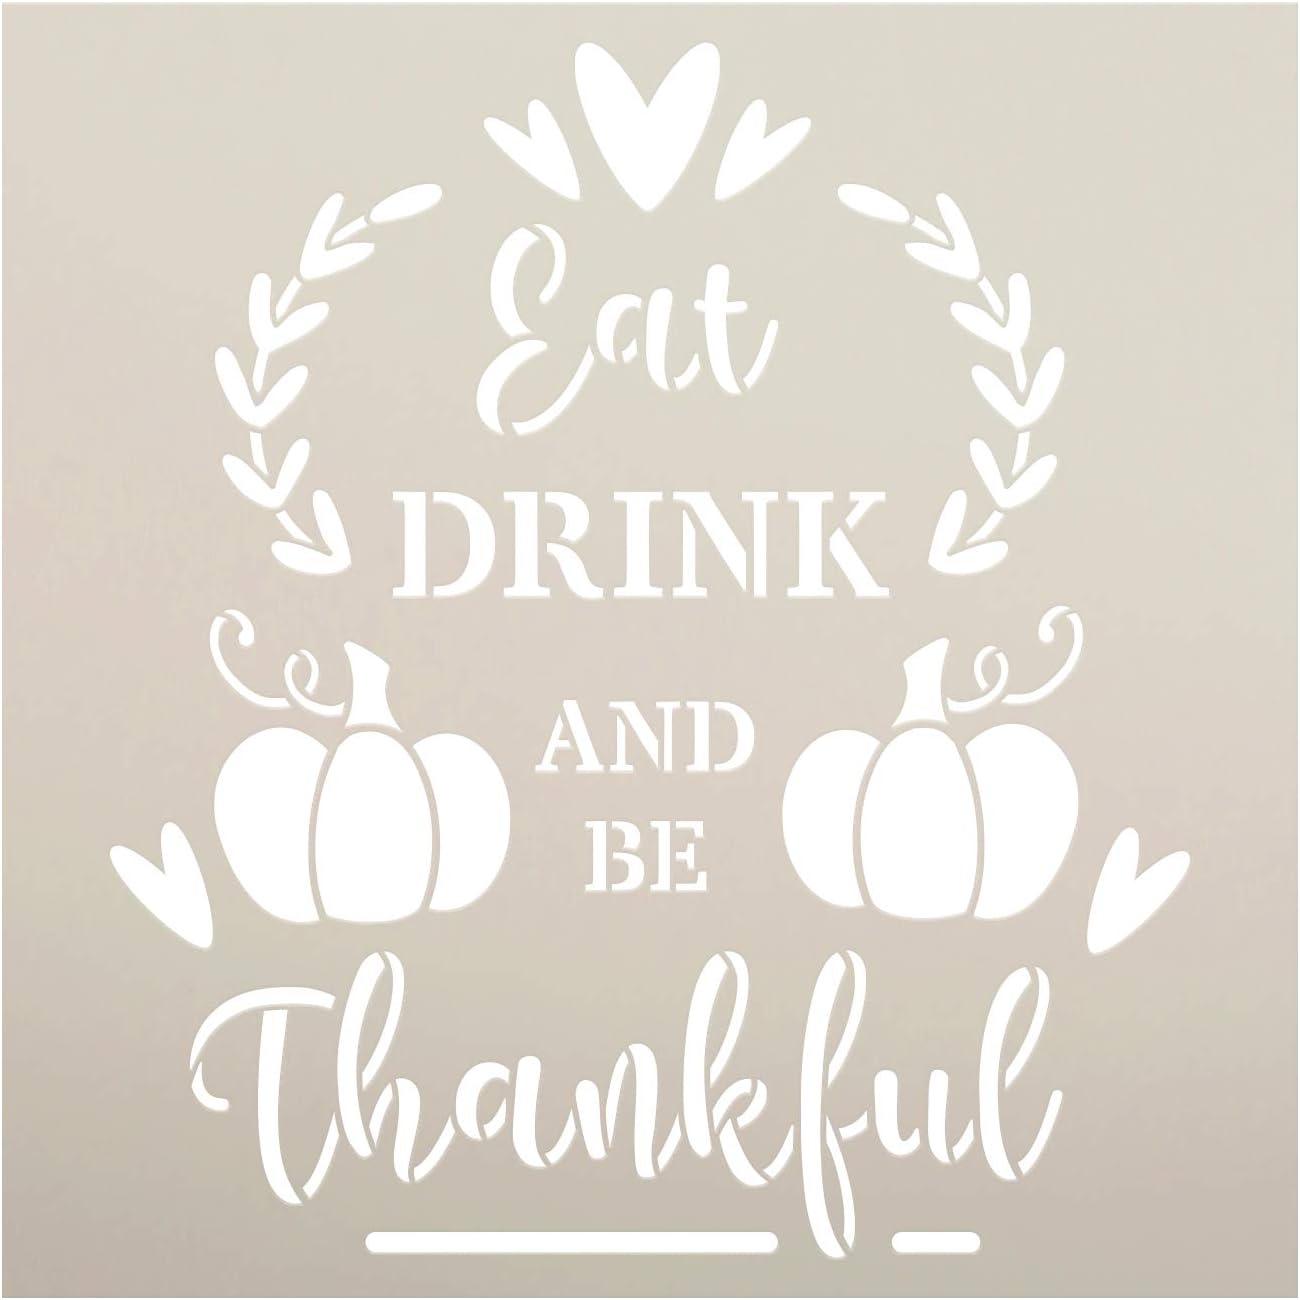 Eat Drink Be Thankful Stencil By Studior12 Diy Autumn Family Home Decor Craft Paint Wood Sign Reusable Mylar Template Pumpkin Laurel Heart Cursive Script Select Size